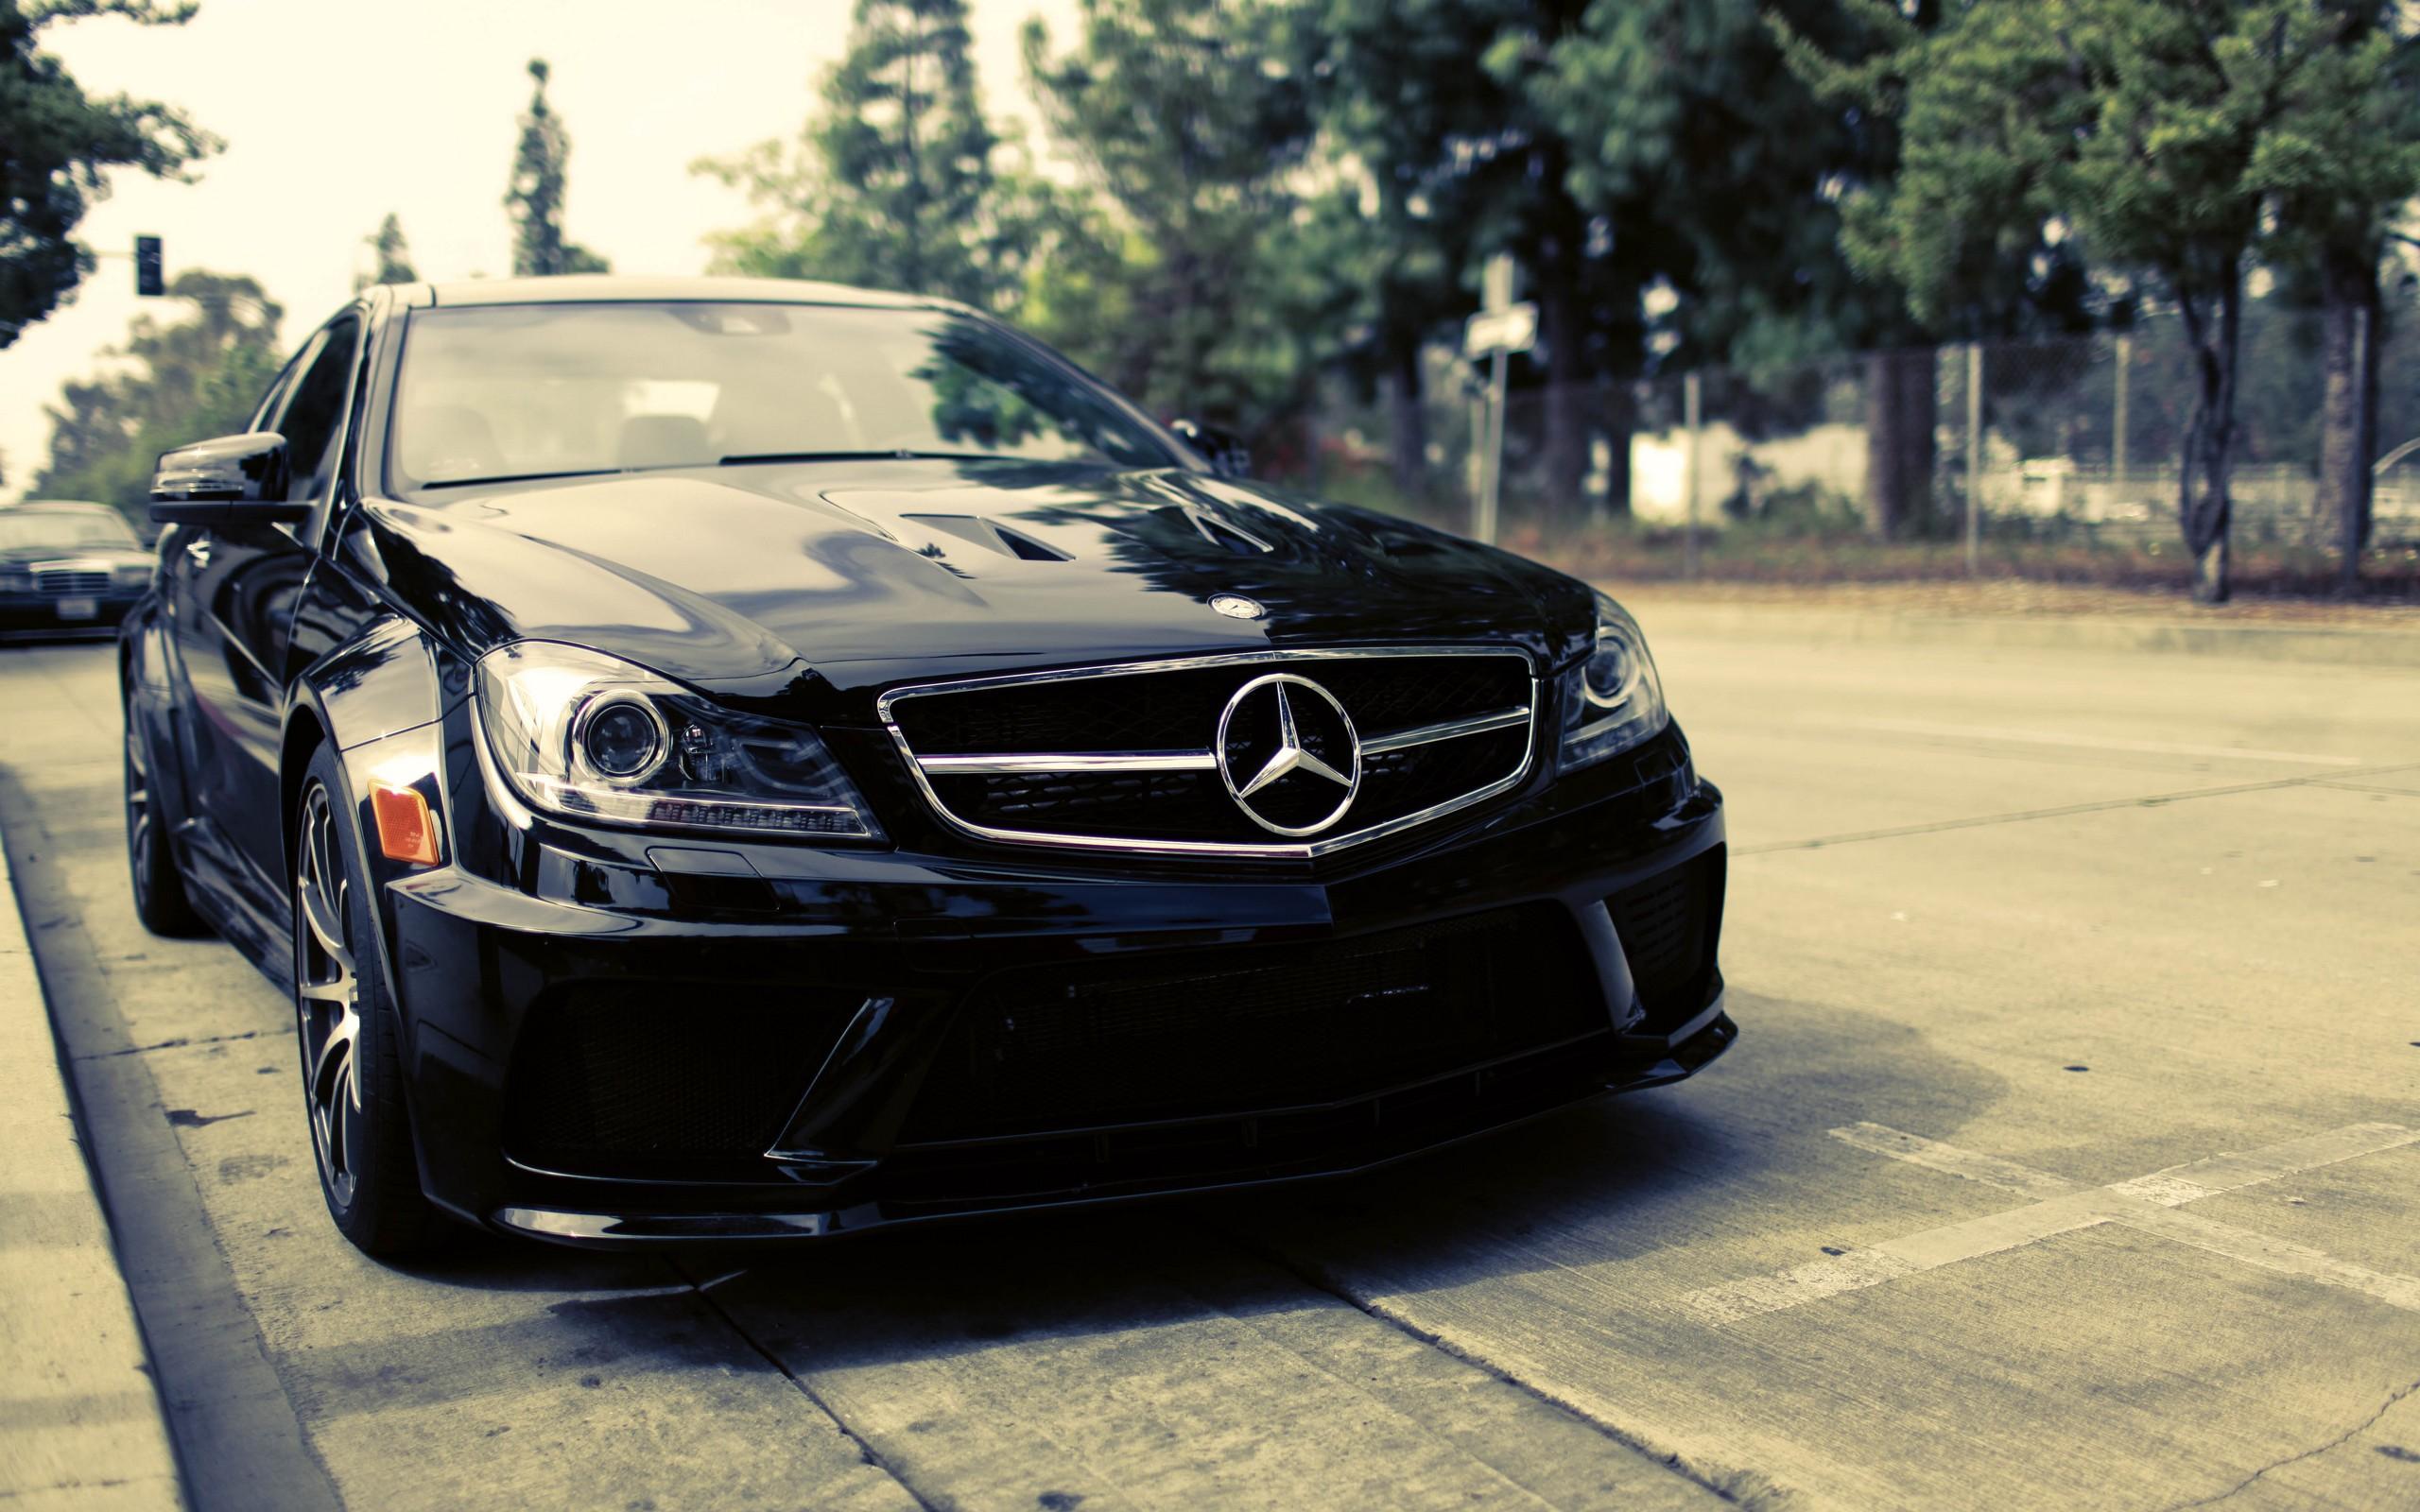 Black Luxury Vehicles: Black Mercedes Luxury Car Wallpaper